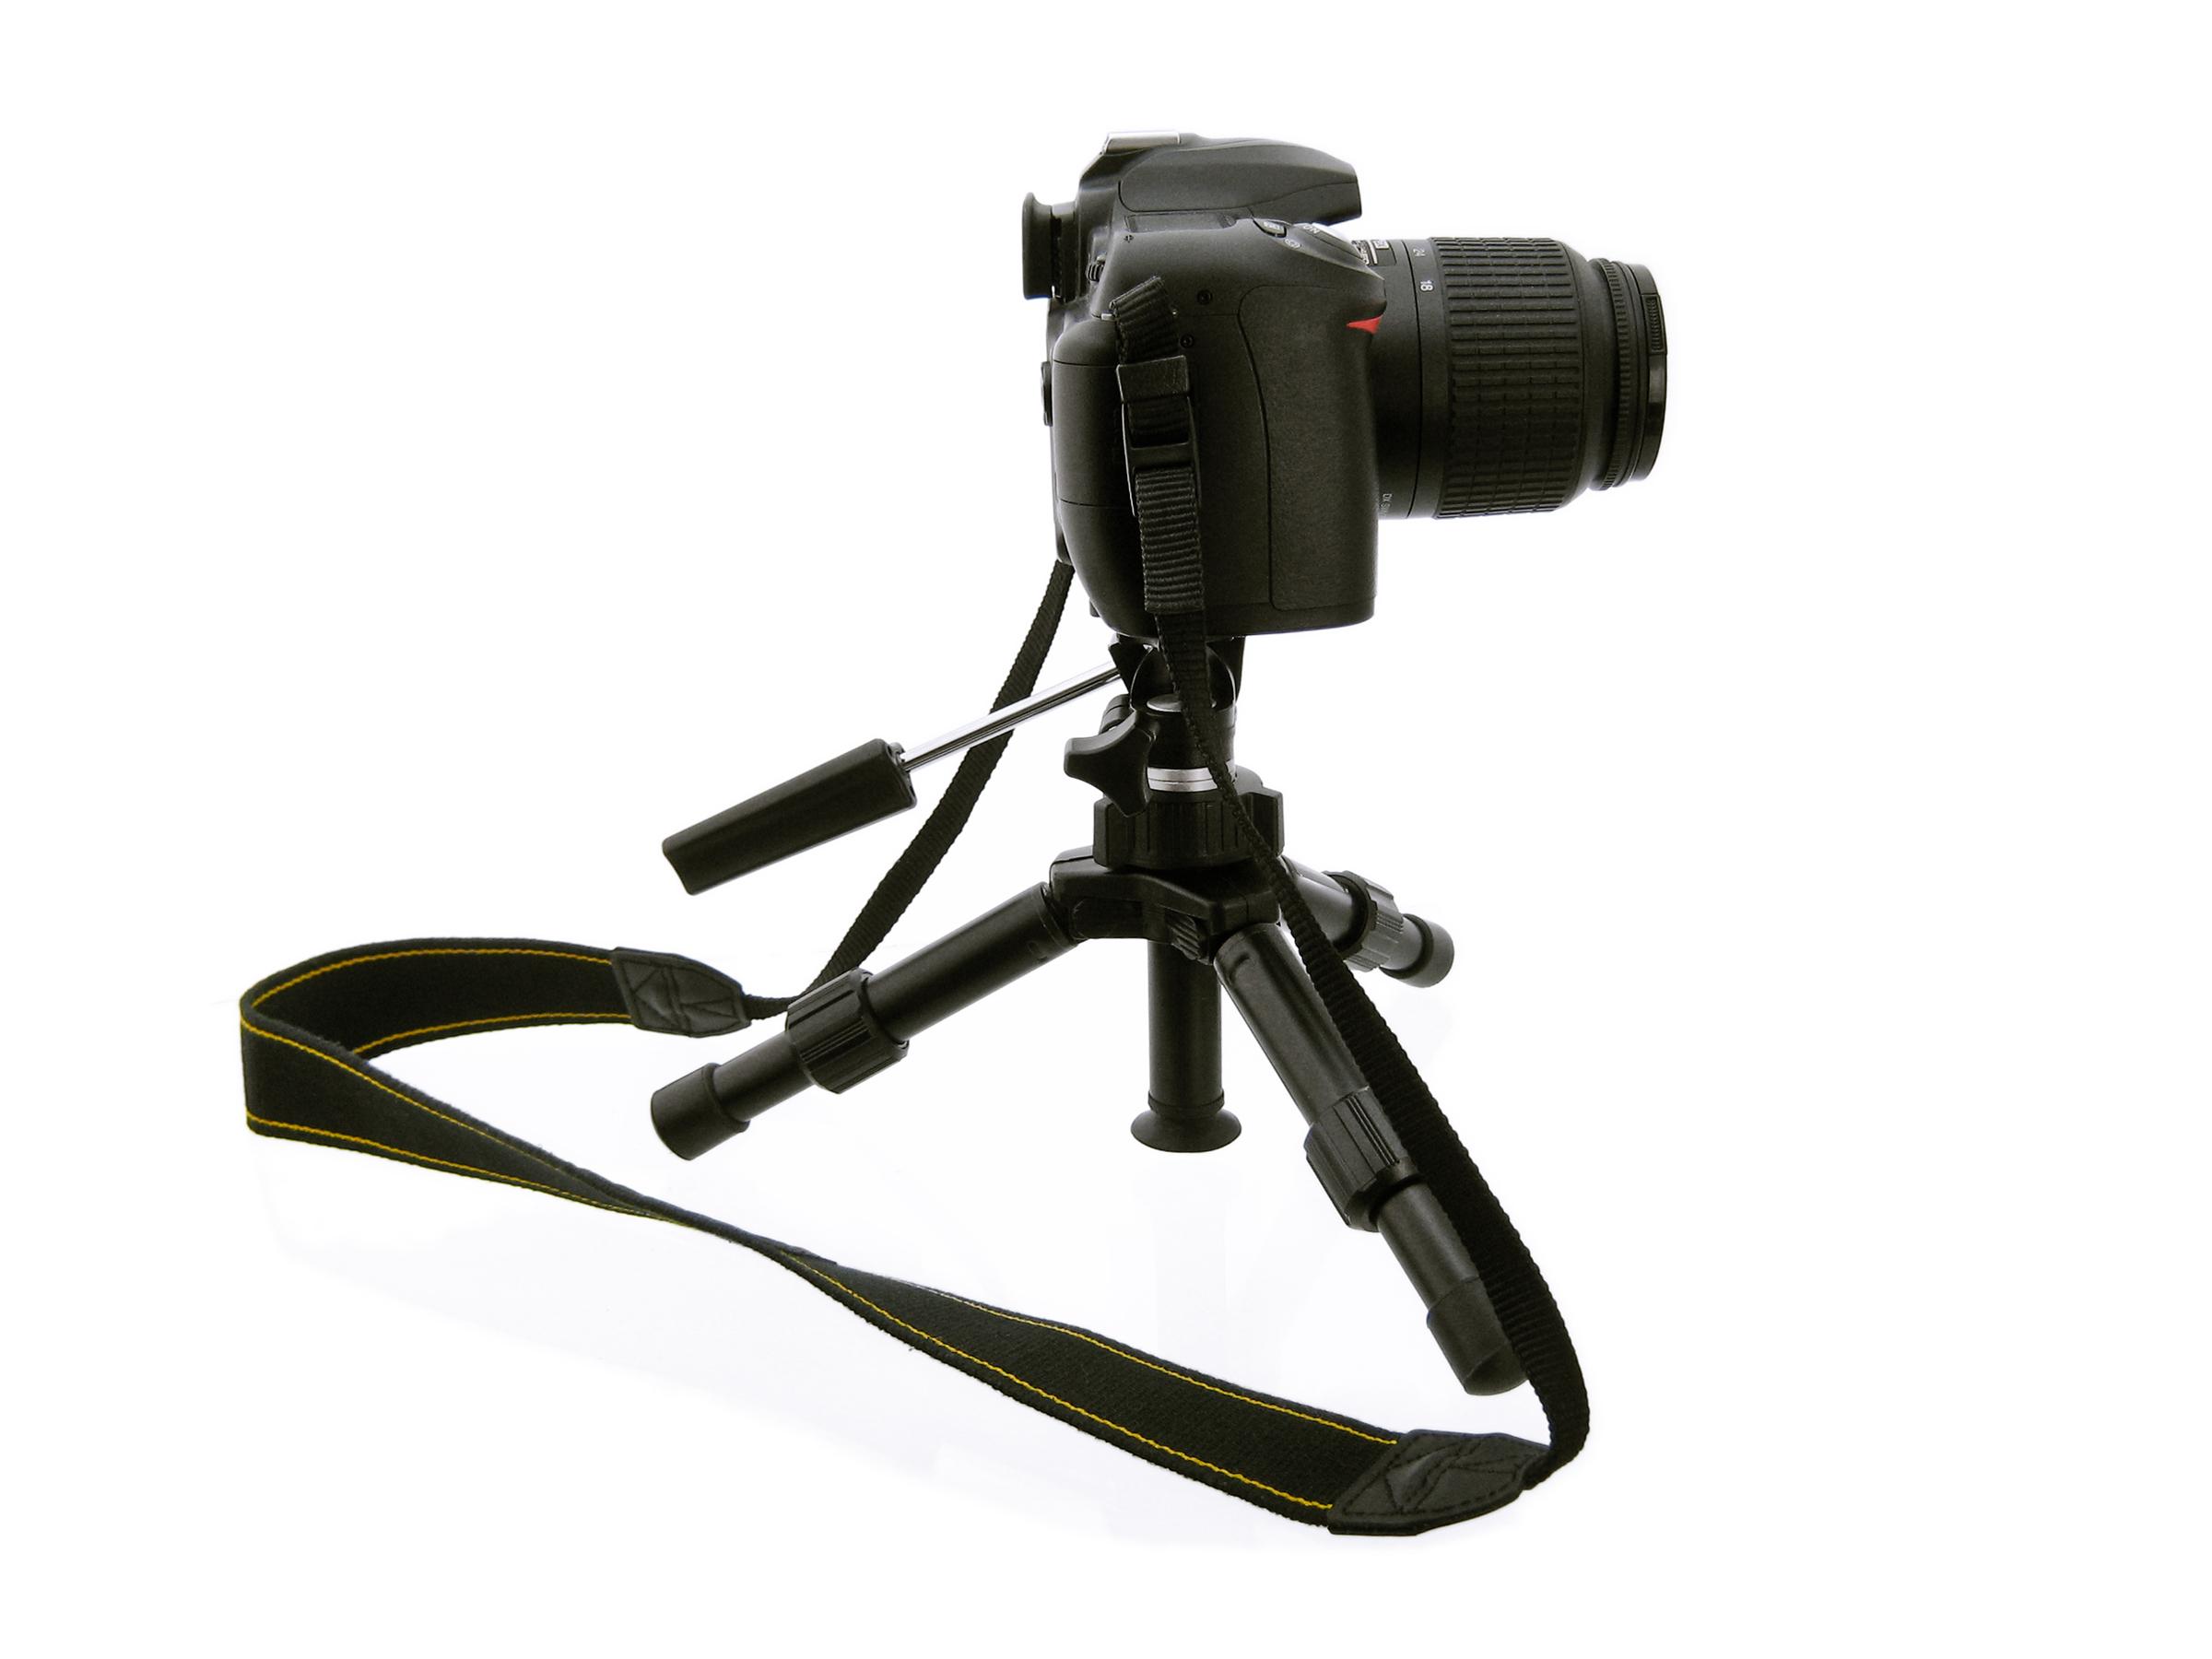 Camera on Tripod, Black, Photo, Technology, Stability, HQ Photo